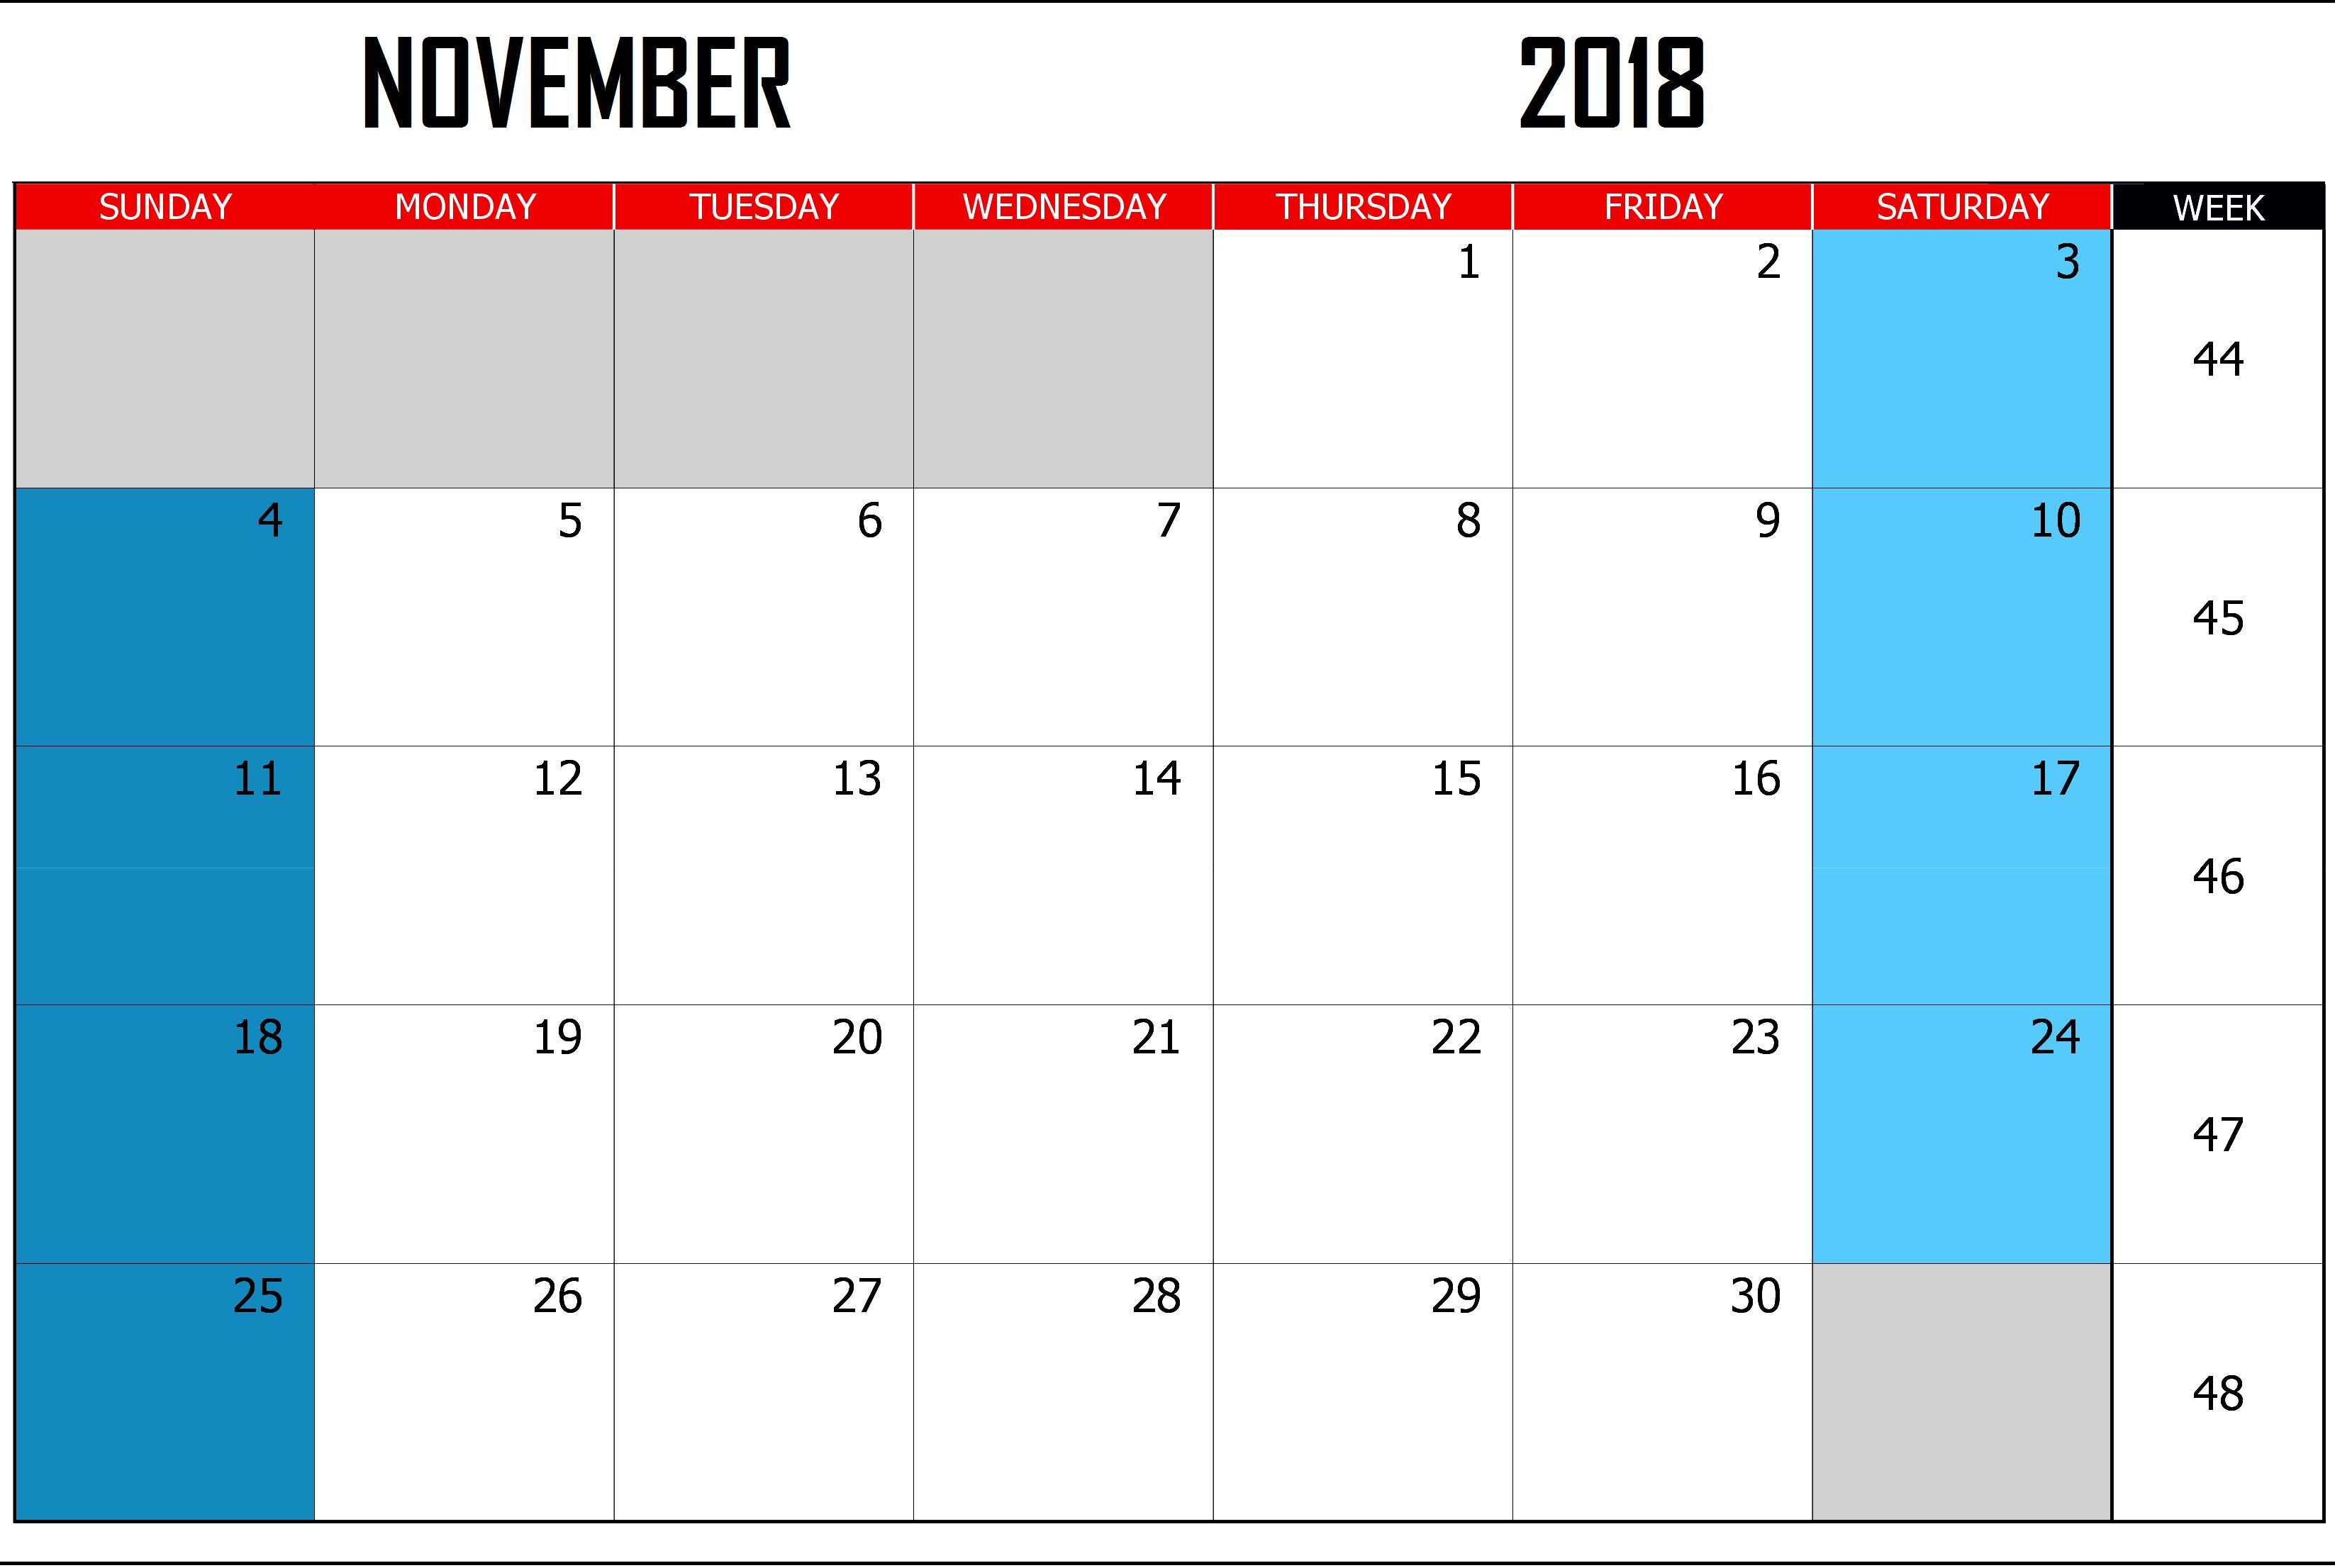 december 2018 calendar uk printable decembercalendar holidayscalendar ukcalendar decemberukcalendar